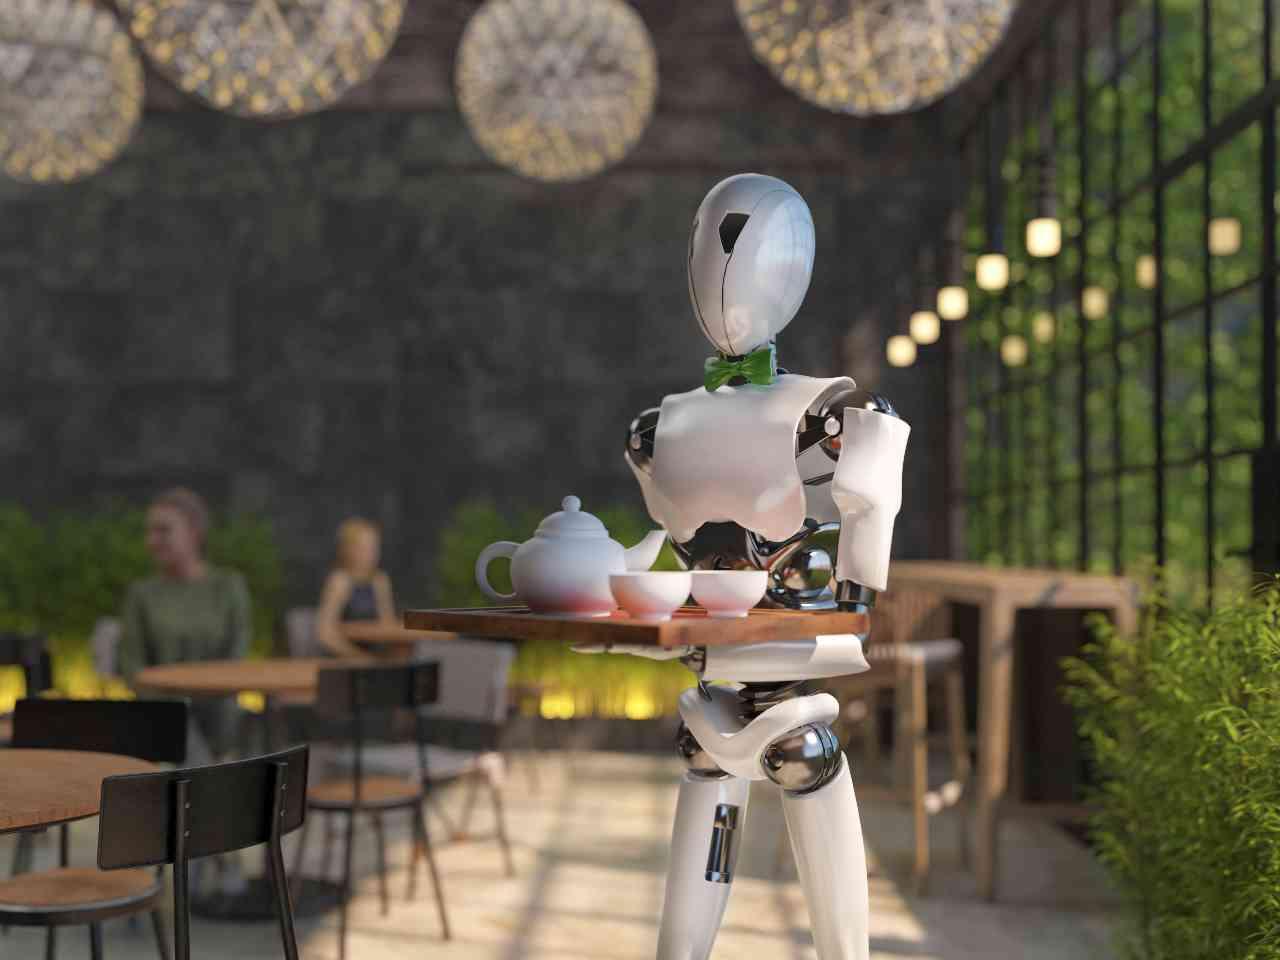 Cameriere robot - MeteoWeek.com